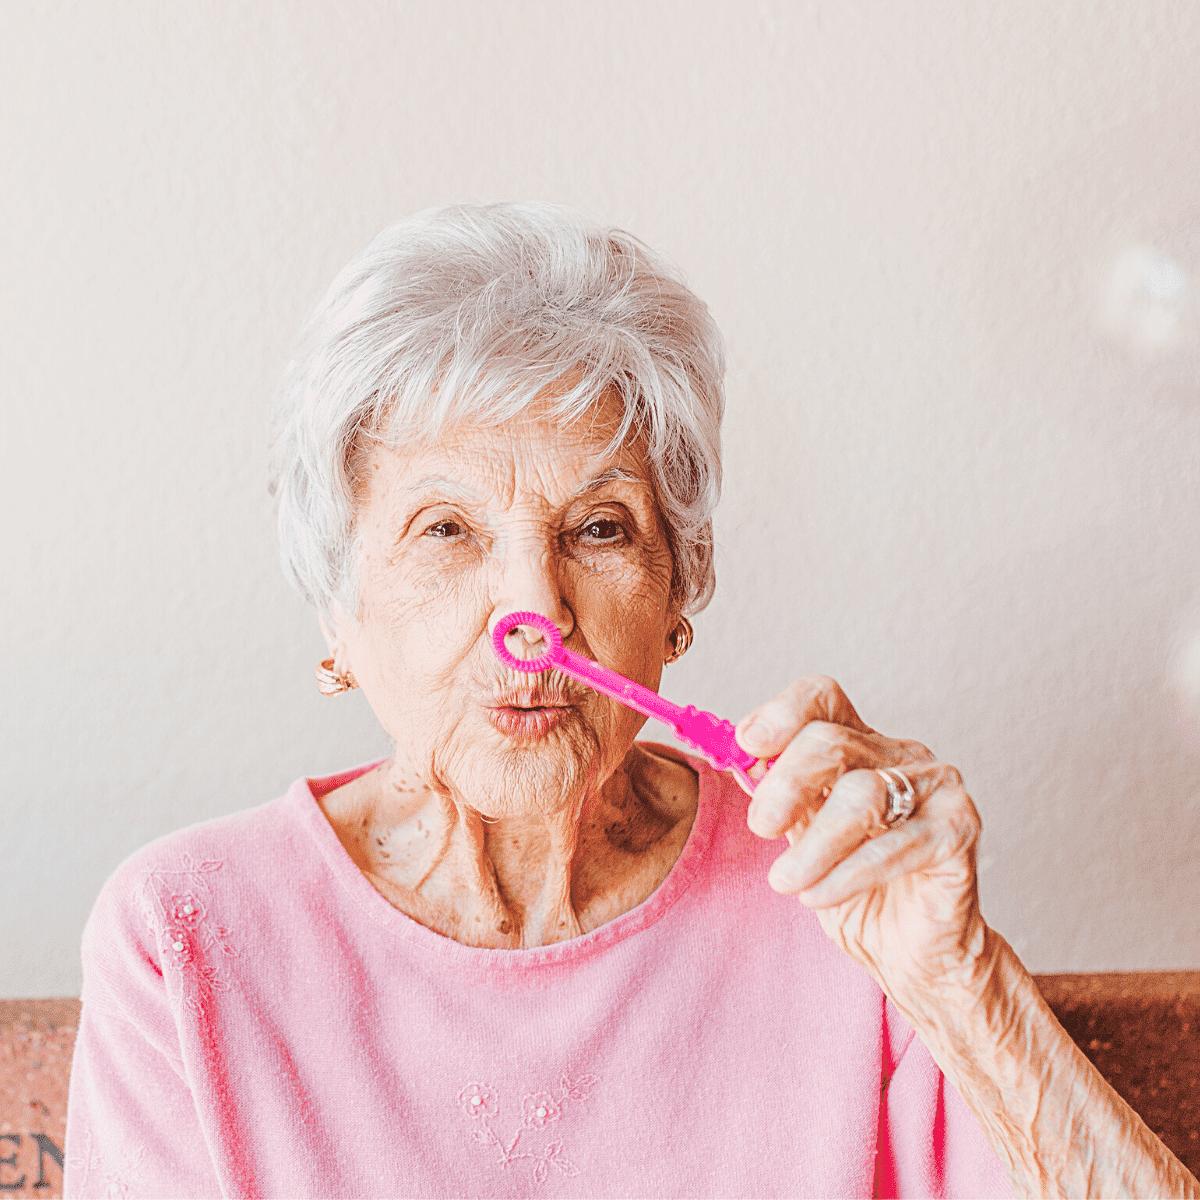 pannoloni incontinenza anziani